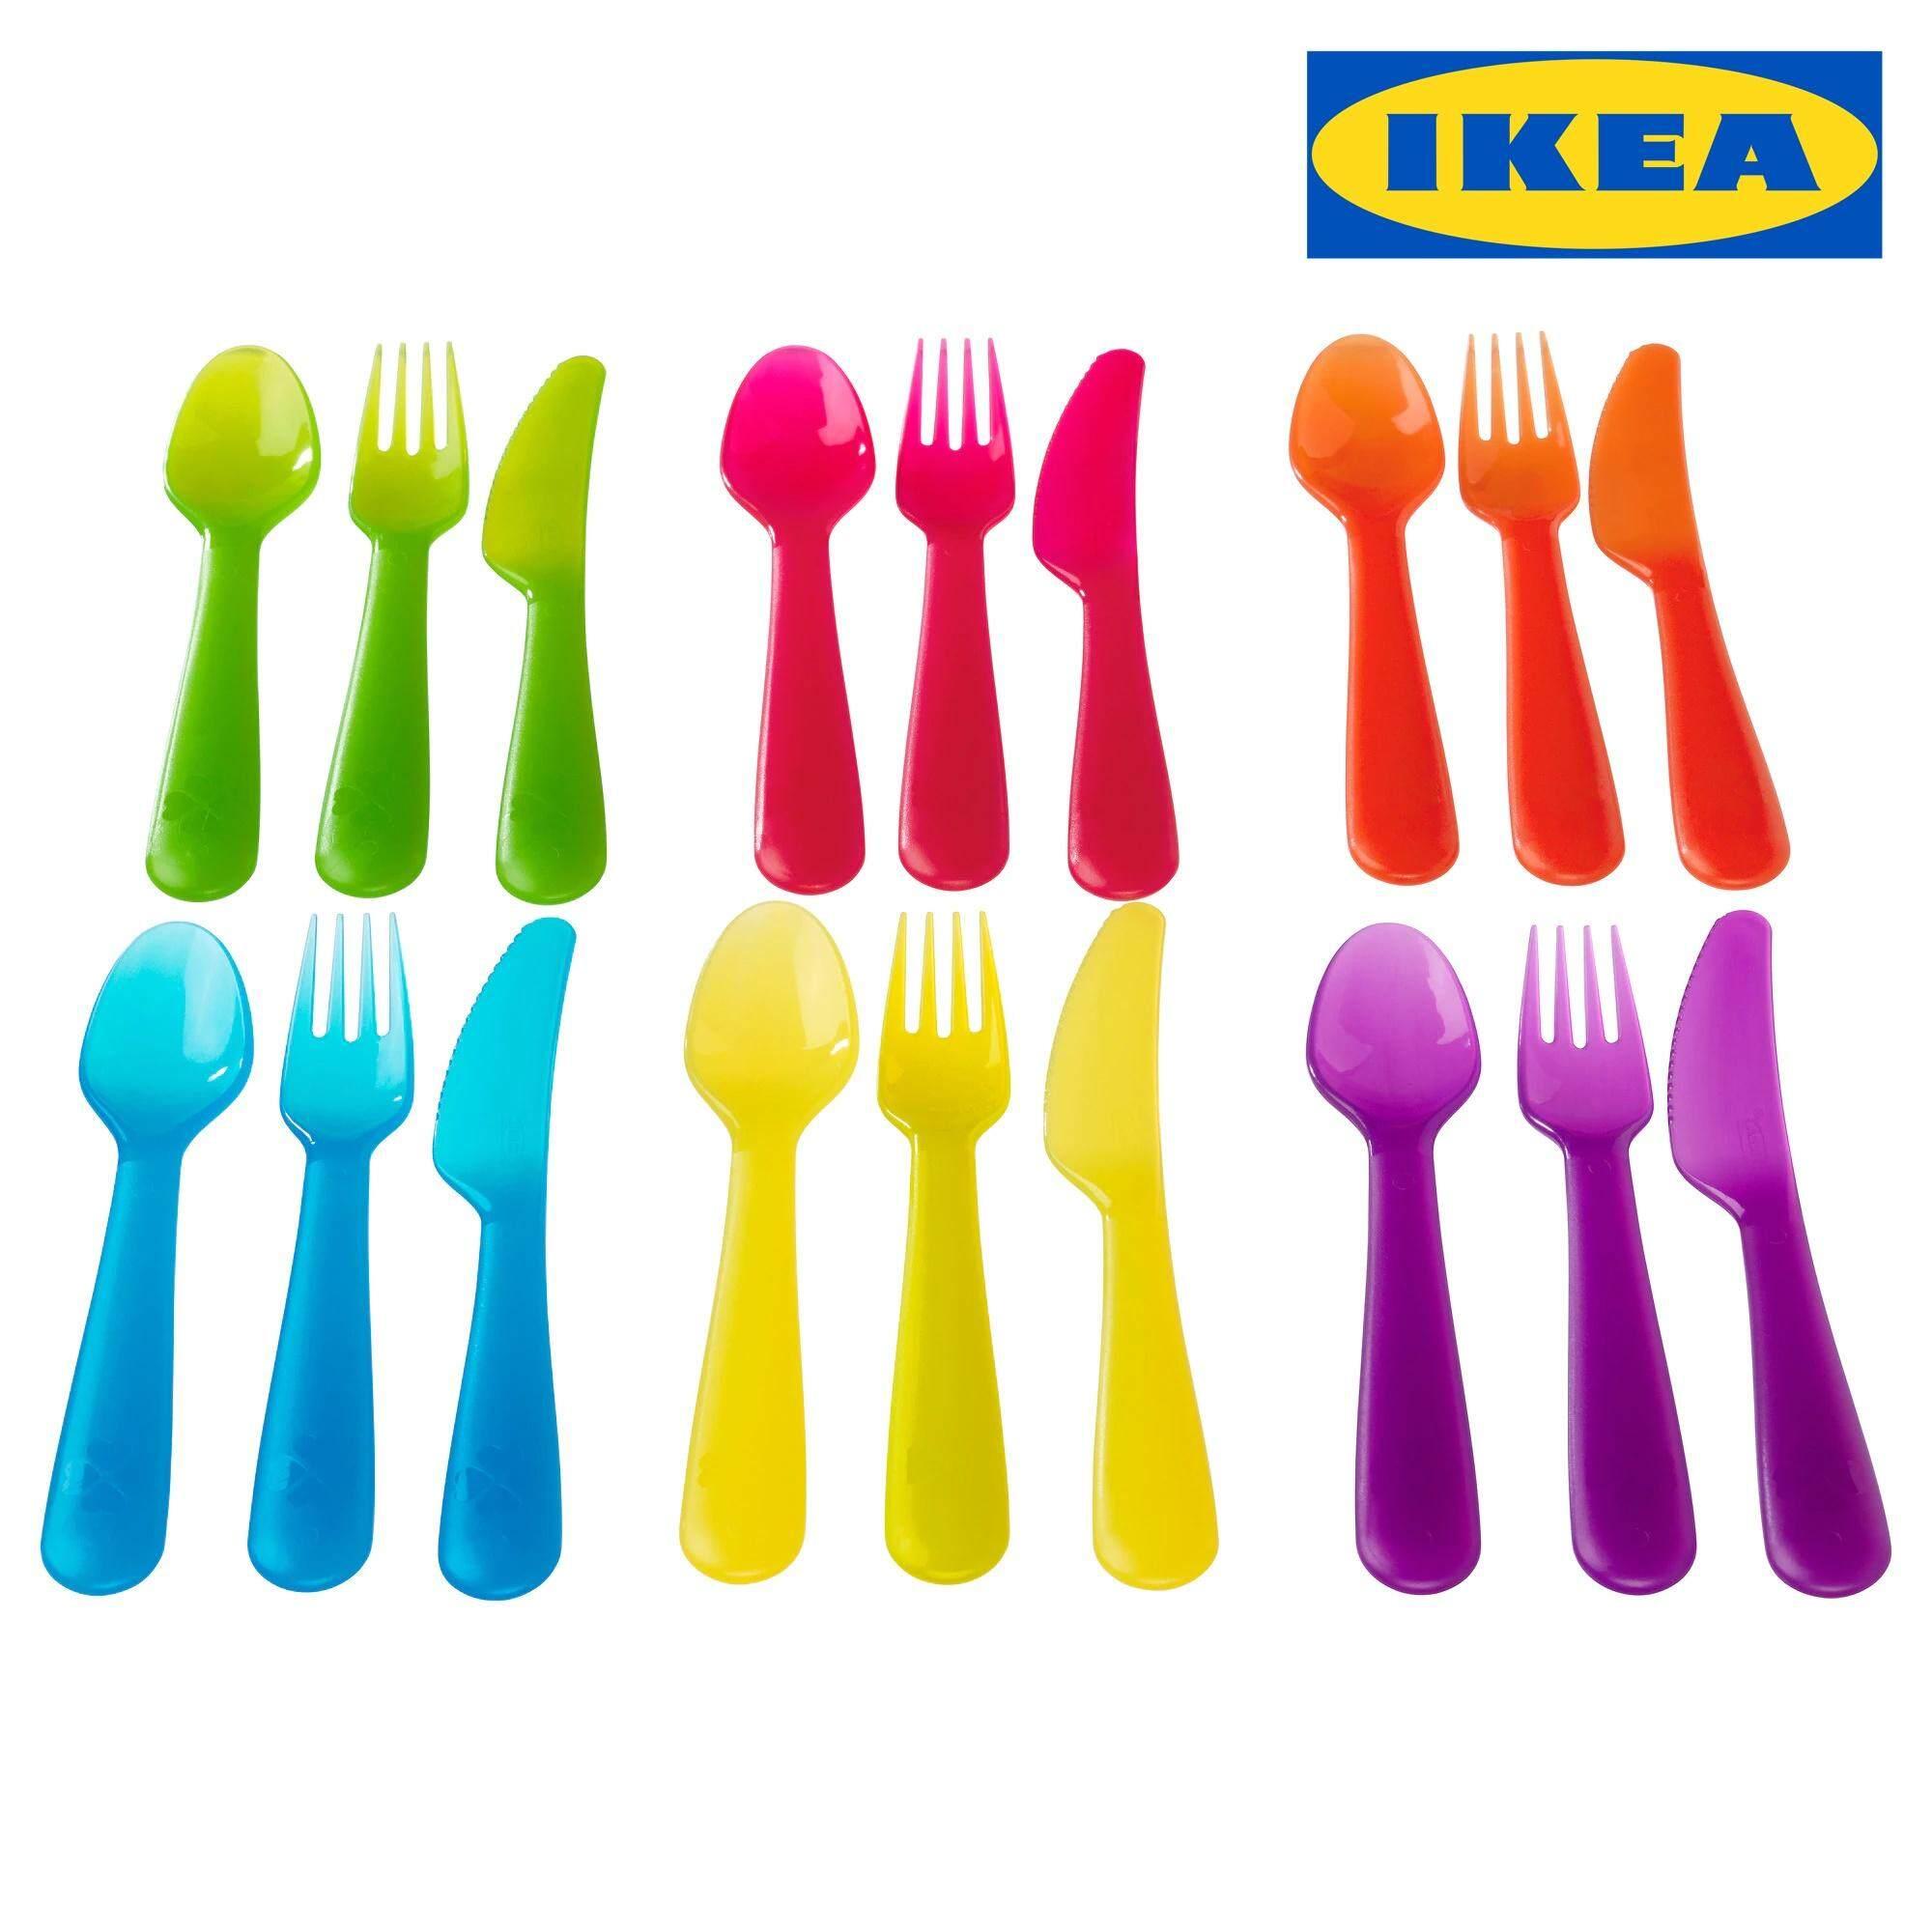 Harga Oxo Tot Feeding Spoon Set 6m Green Termurah 2018 Ardell Fashion Lashes 62110 121 Black Bowl Fork Sets Buy At Best Price Ikea Kalas